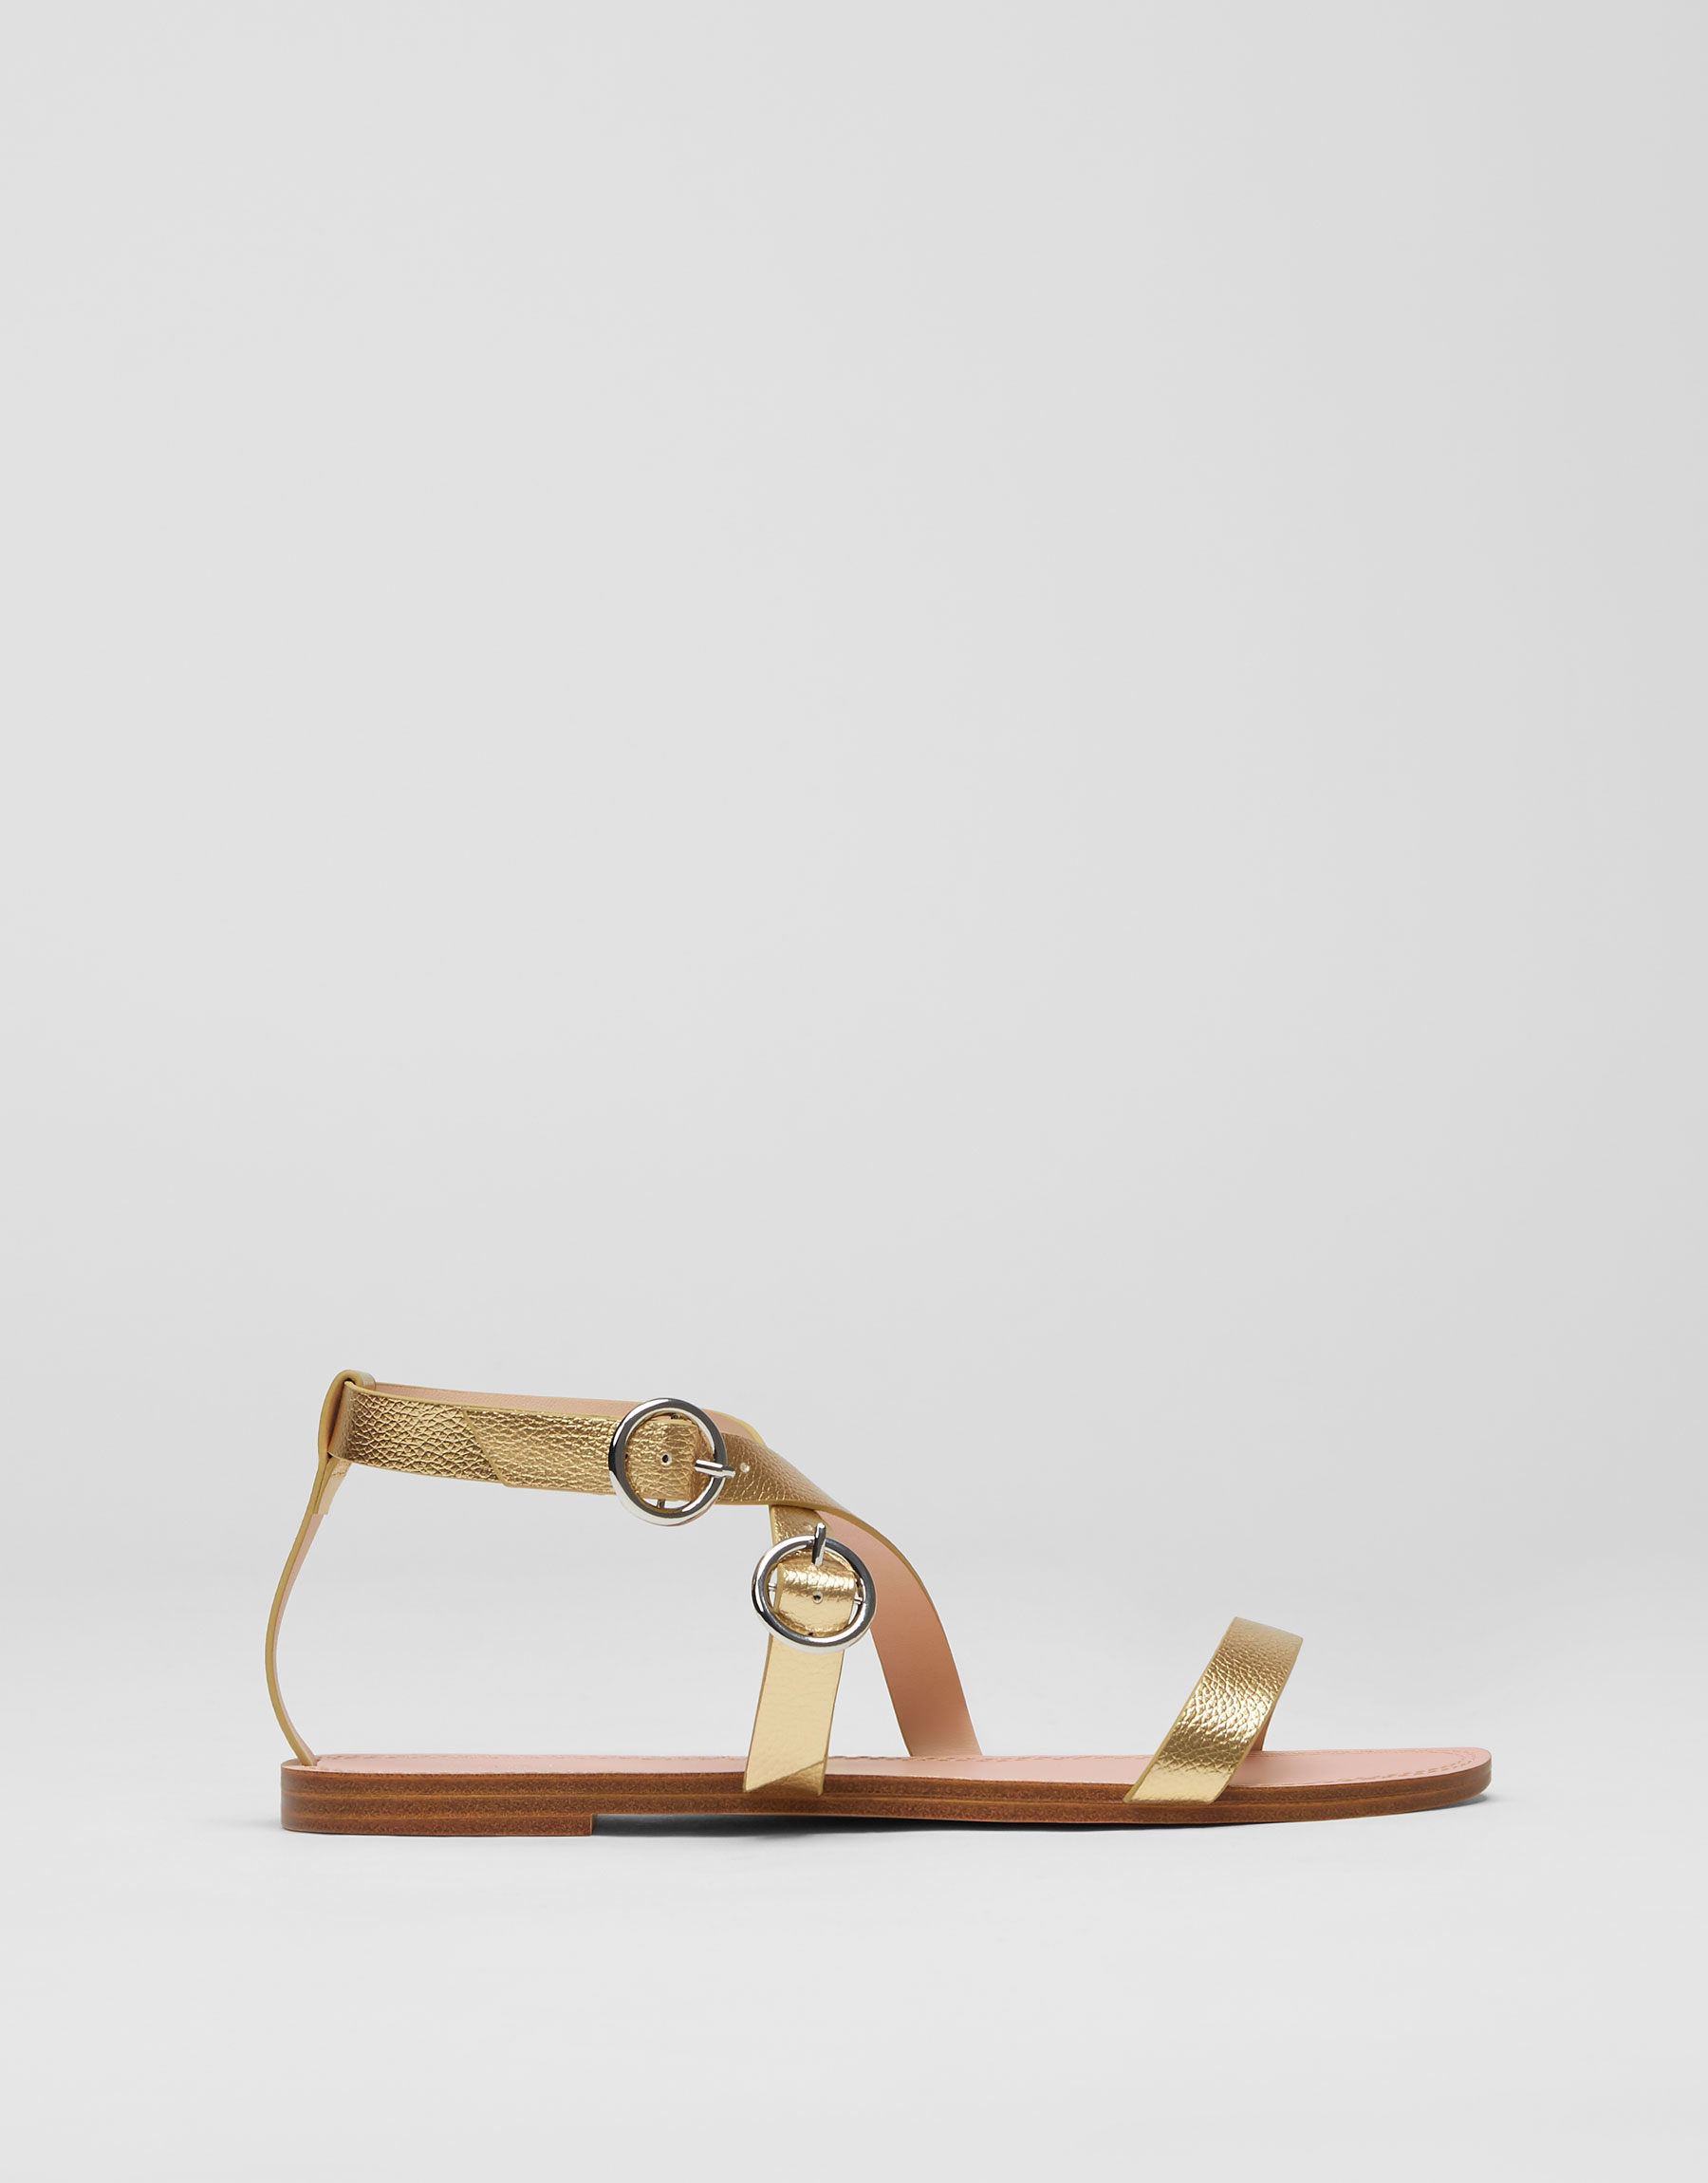 Sandalia básica hebillas dorada